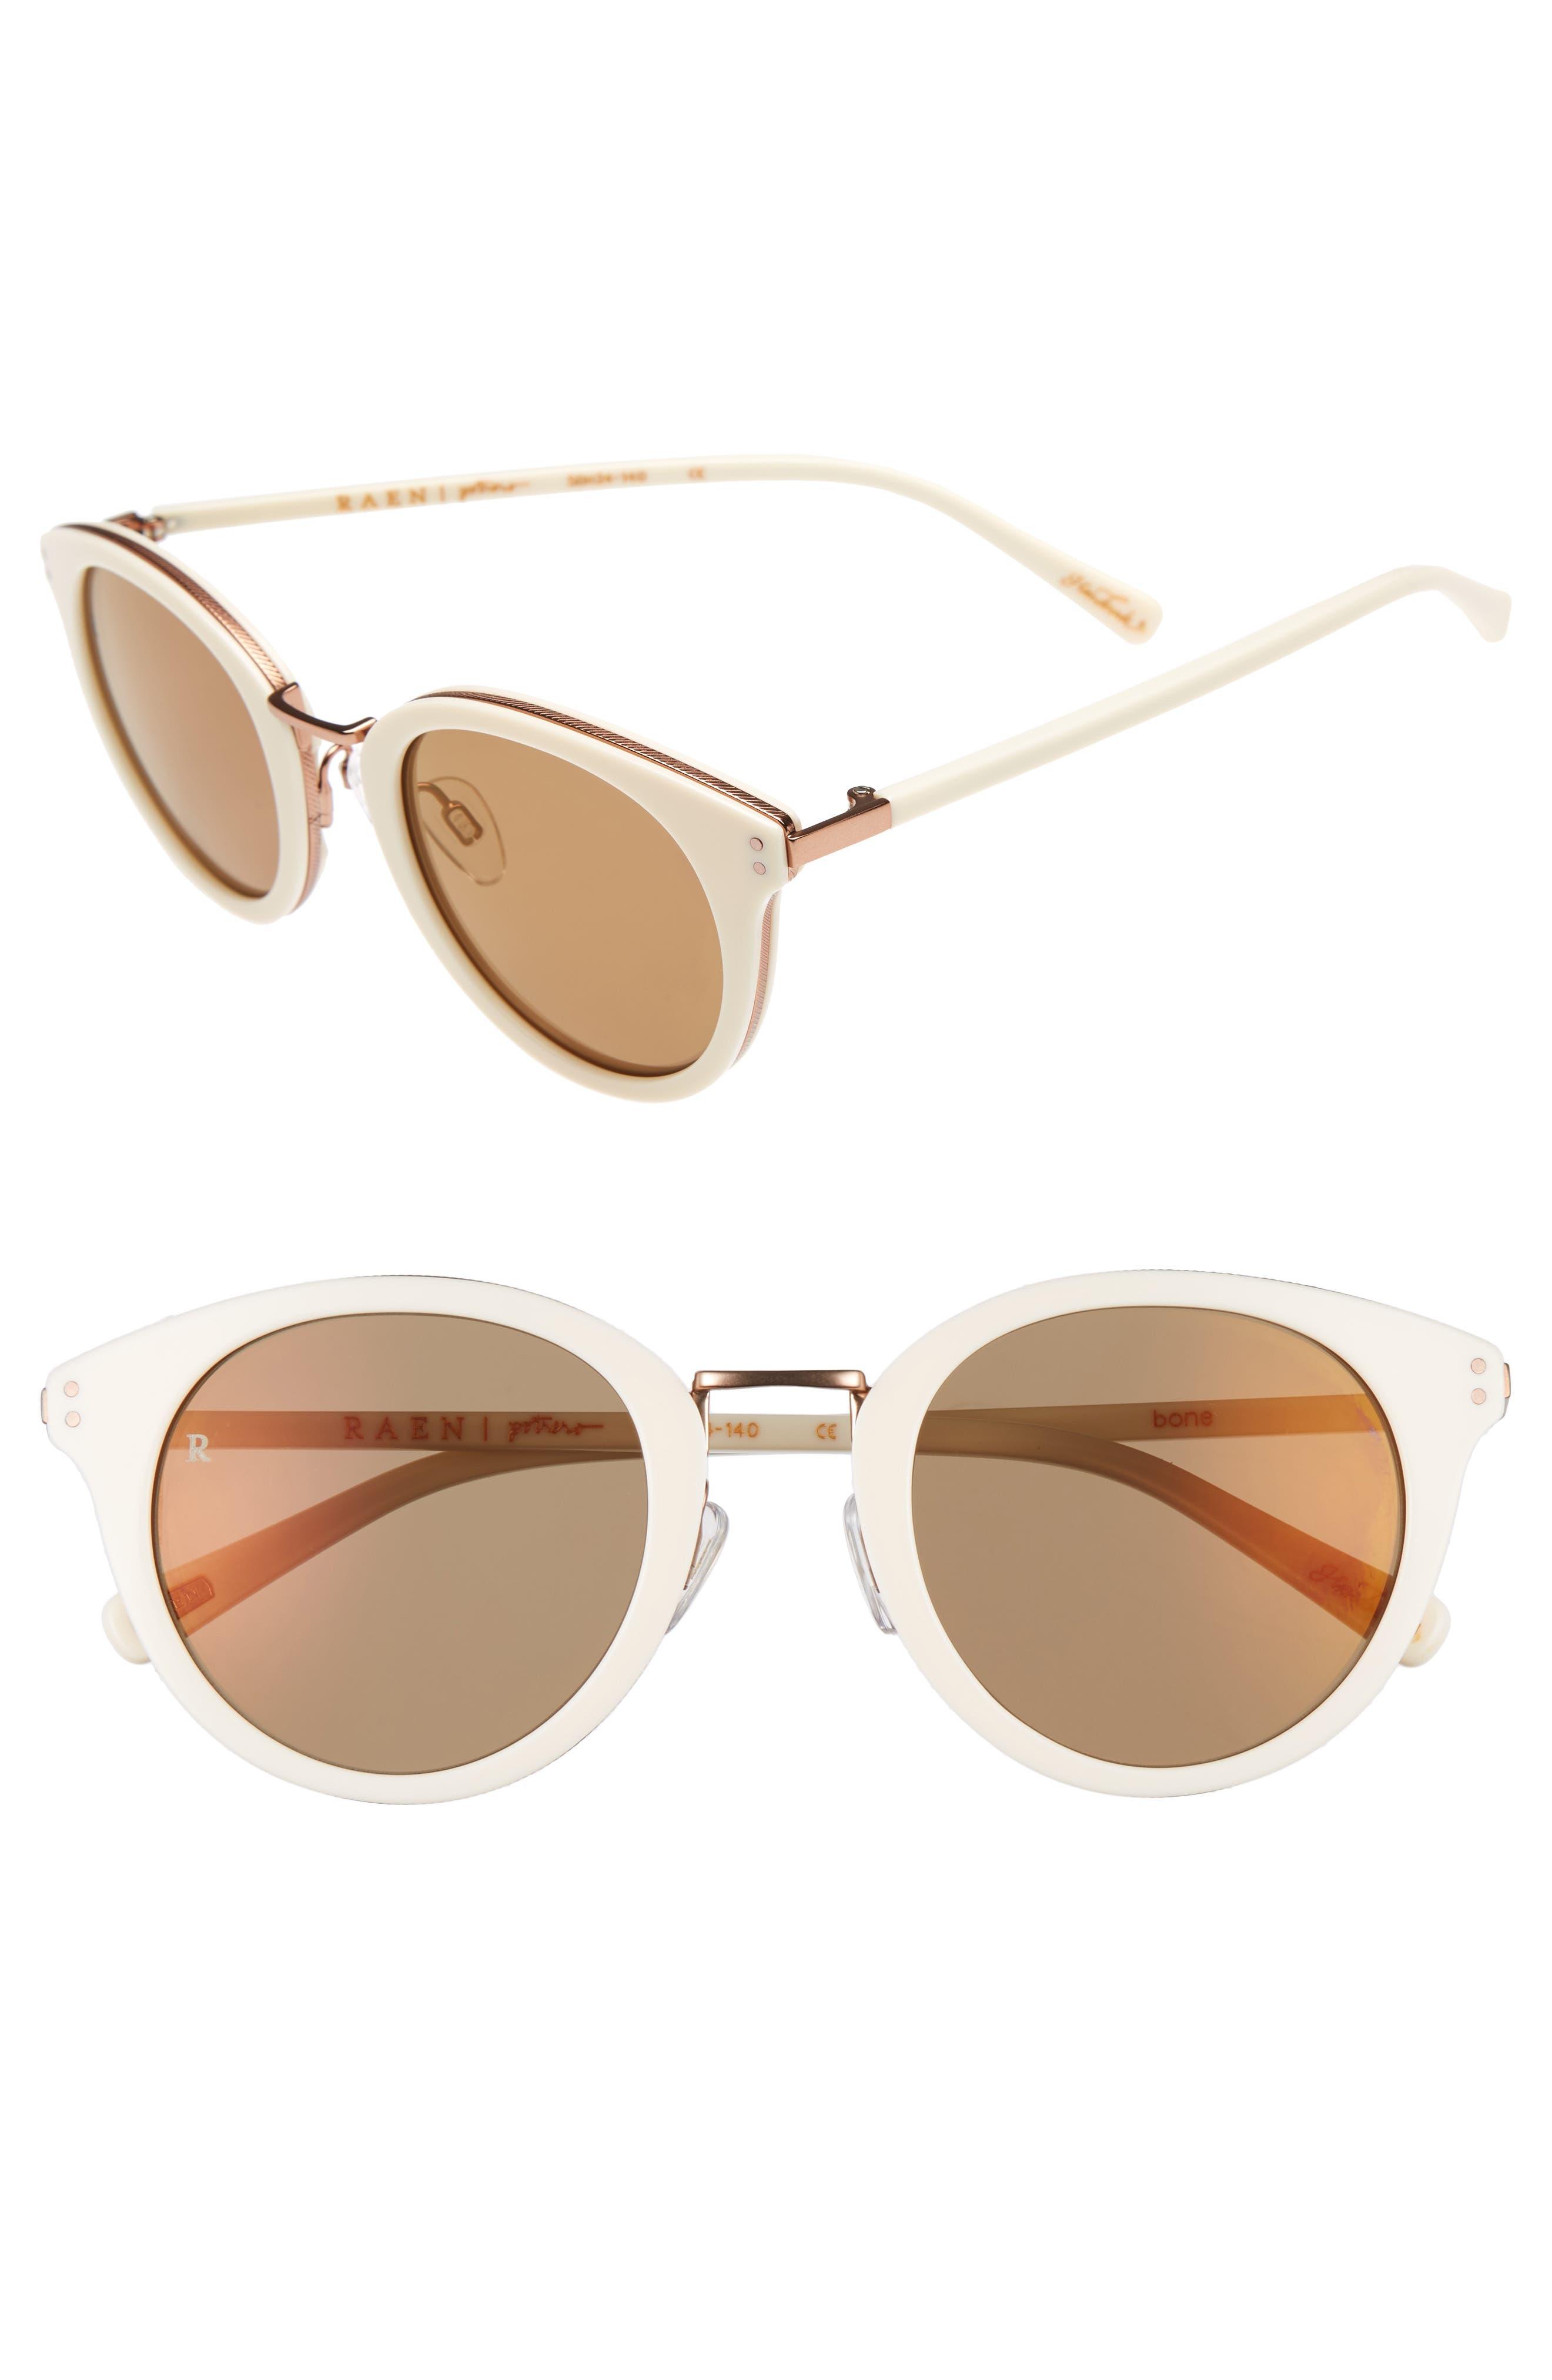 RAEN Portrero 50mm Sunglasses